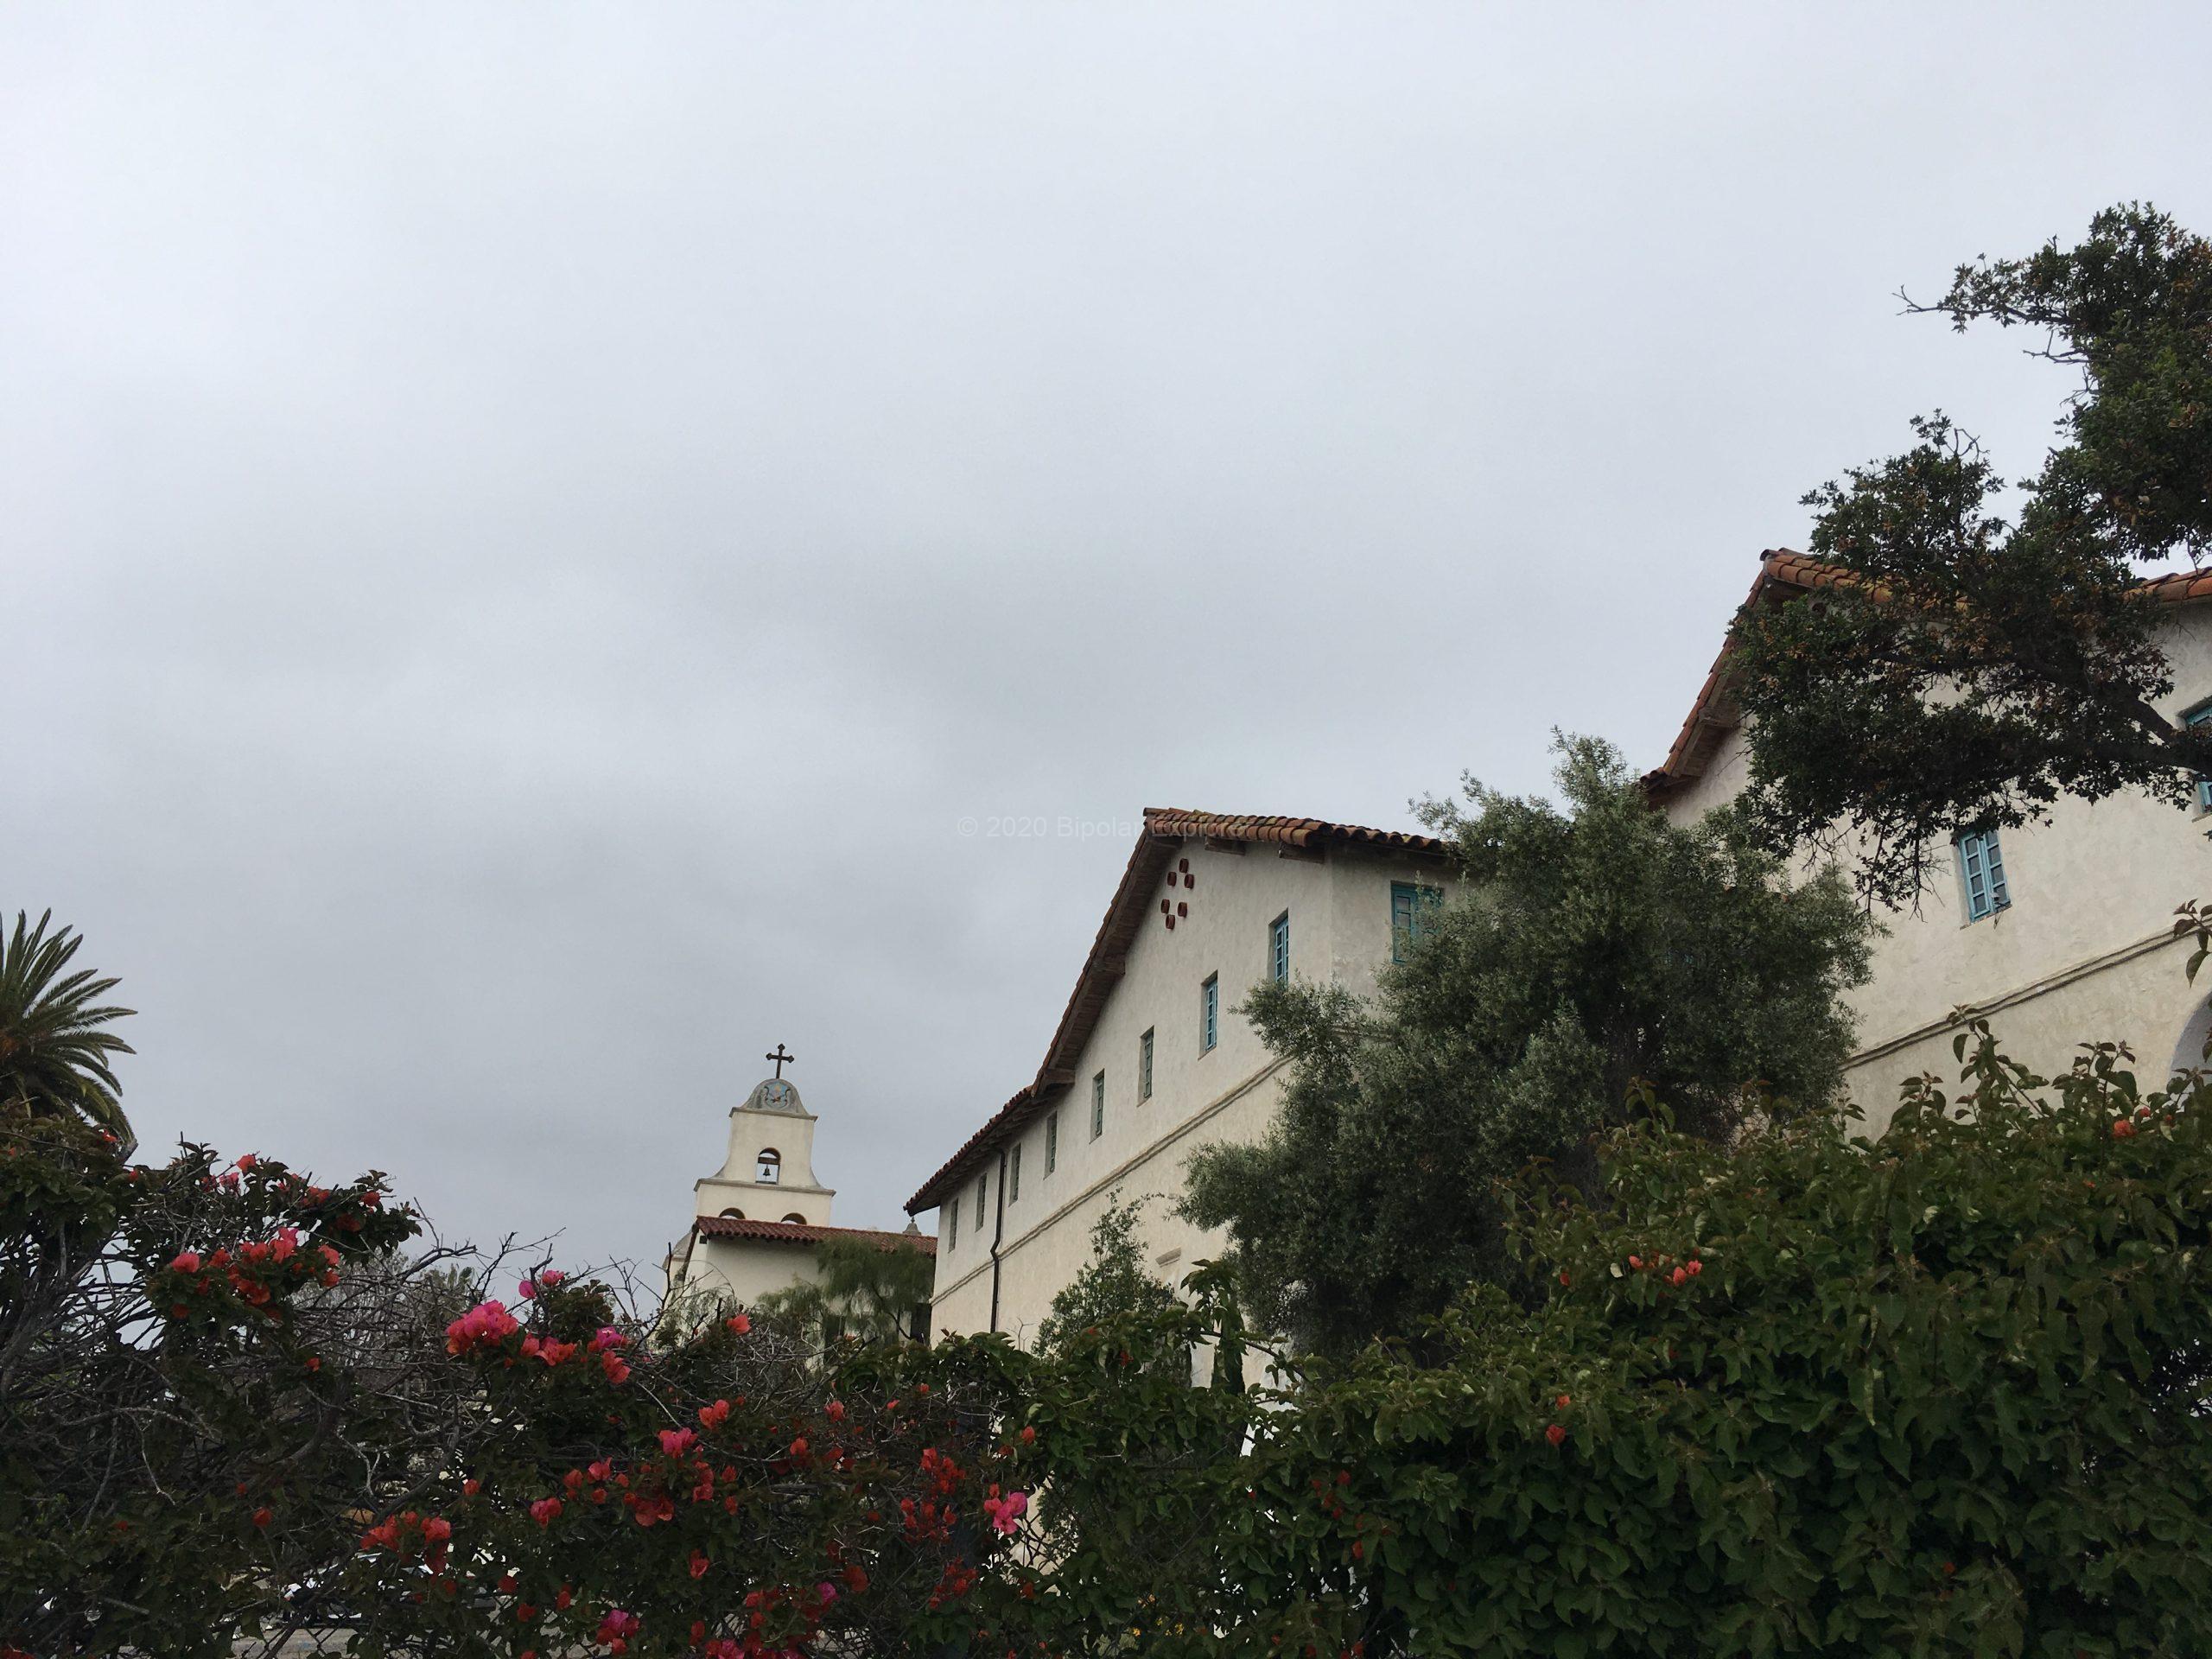 Day 4 Santa Barbara Mission 01